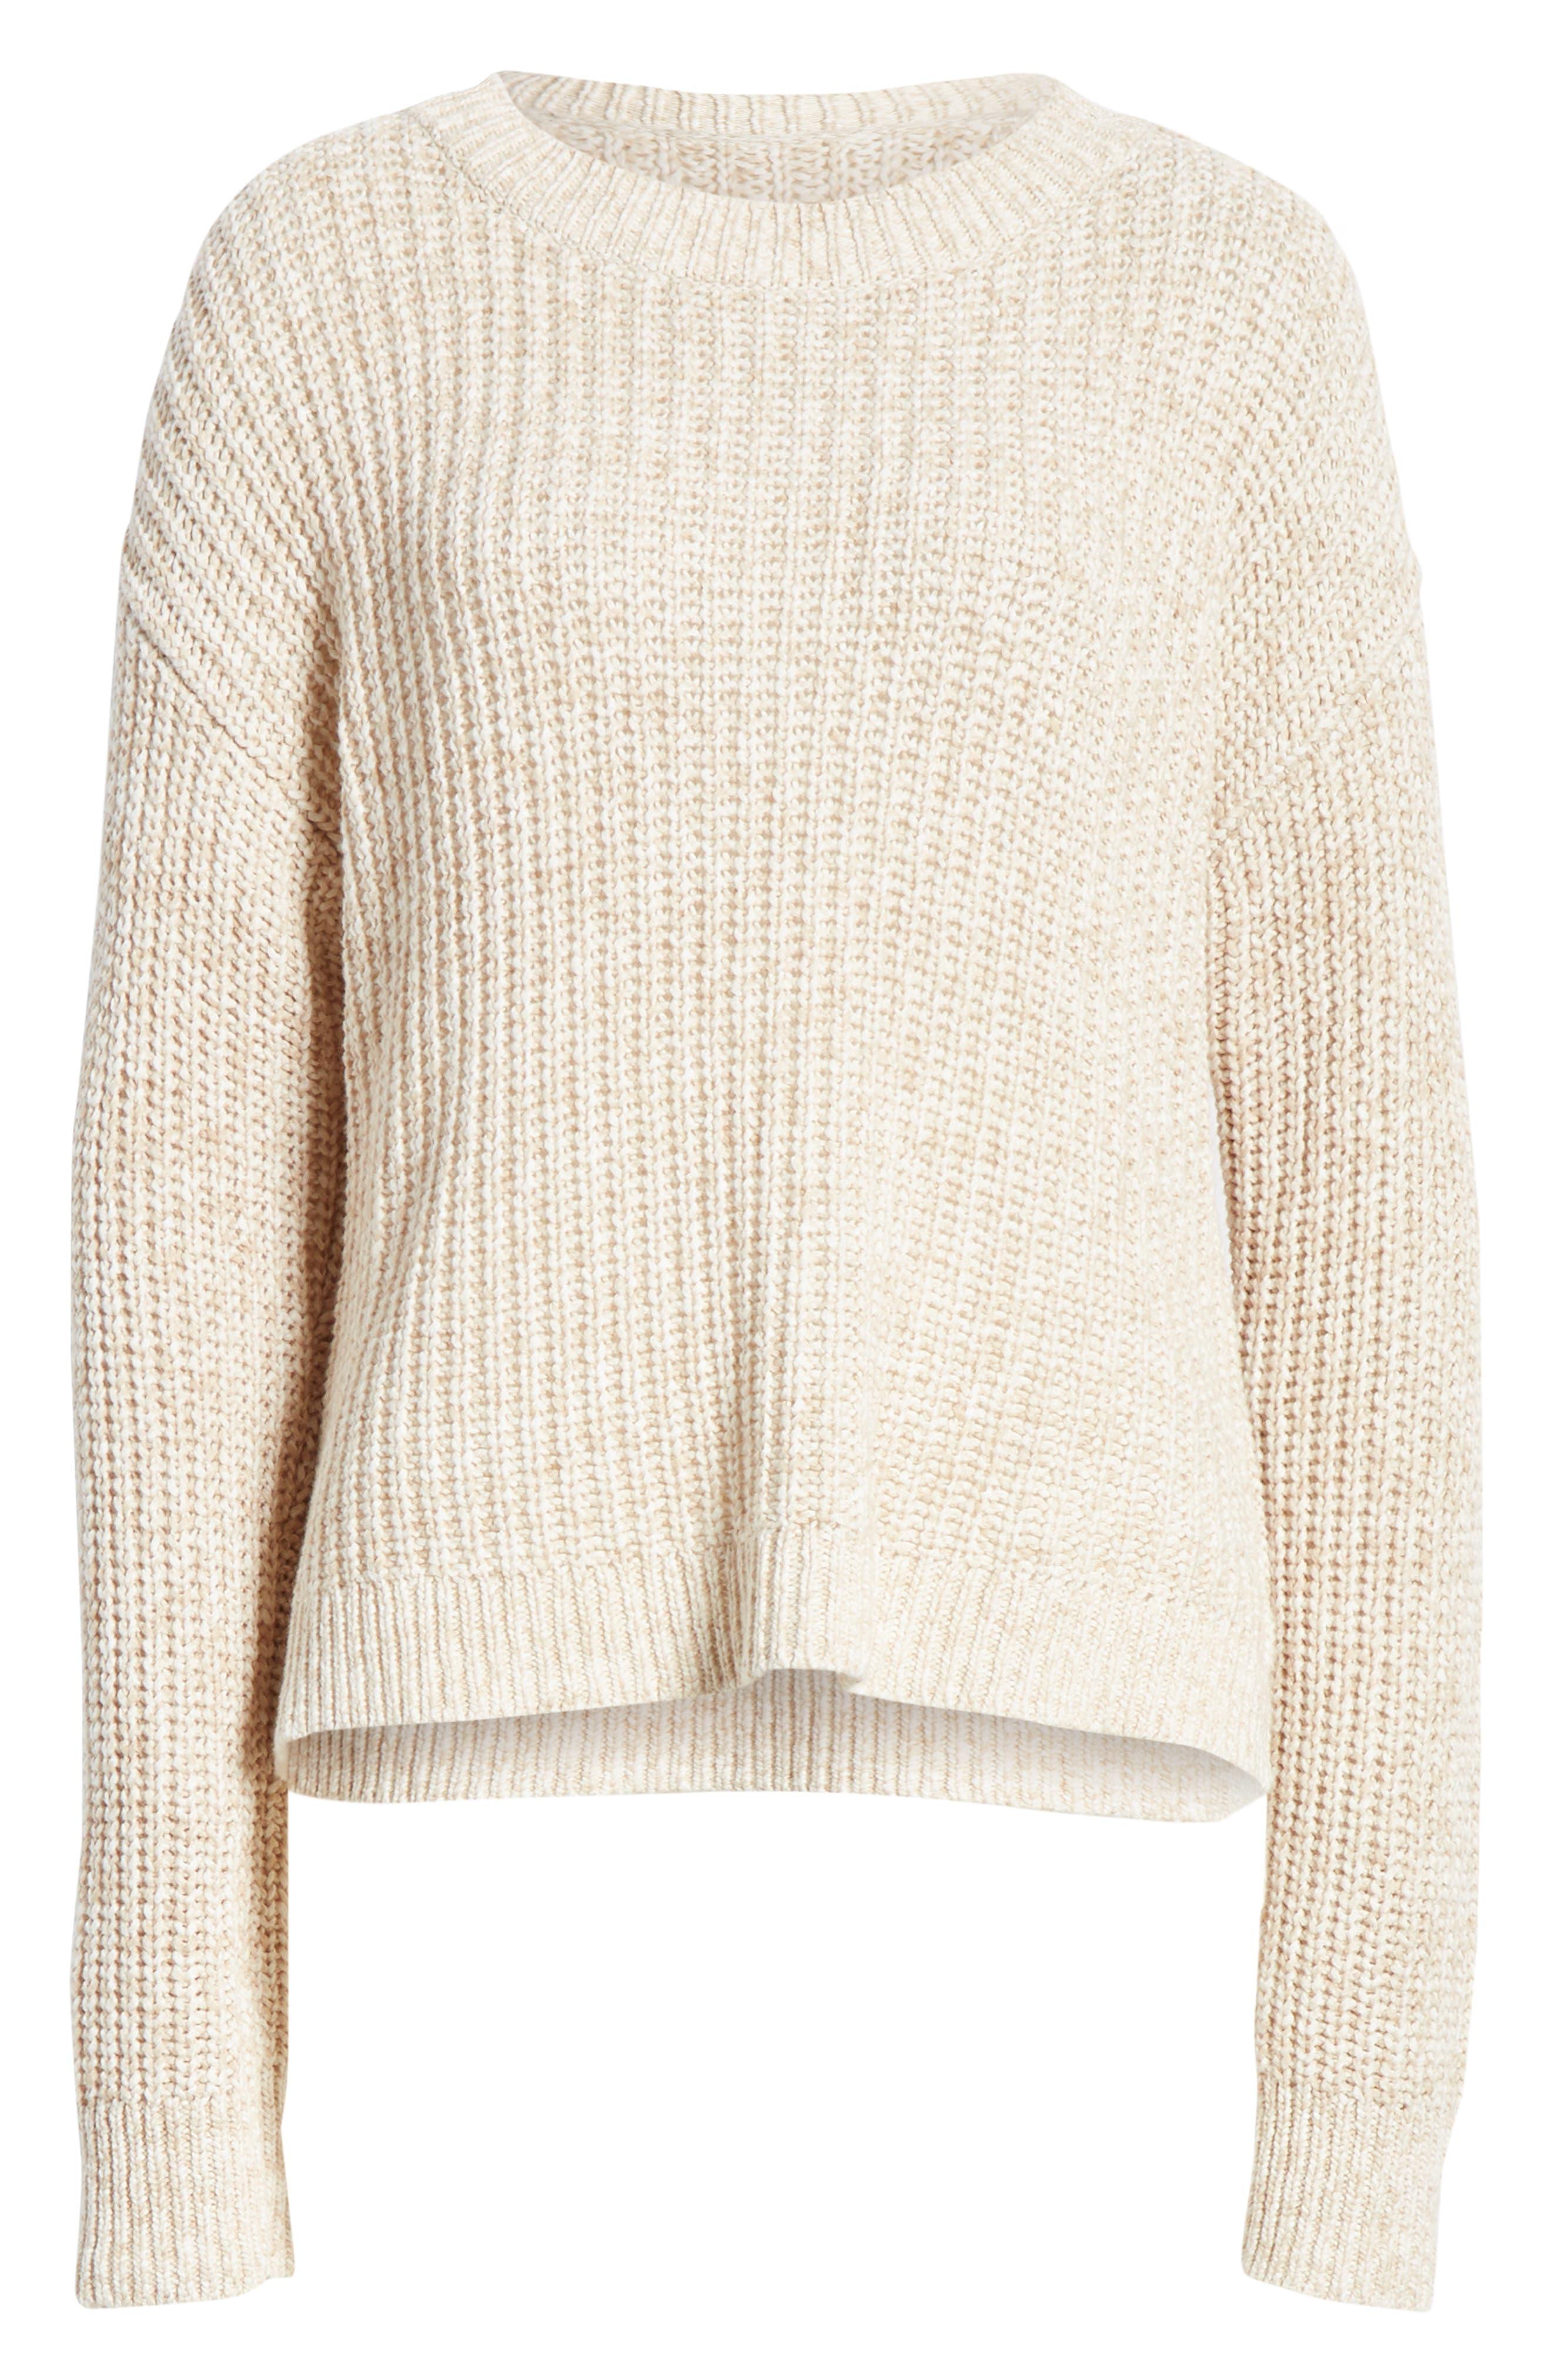 ALEX MILL, Mélange Sweater, Alternate thumbnail 6, color, LIGHT KHAKI